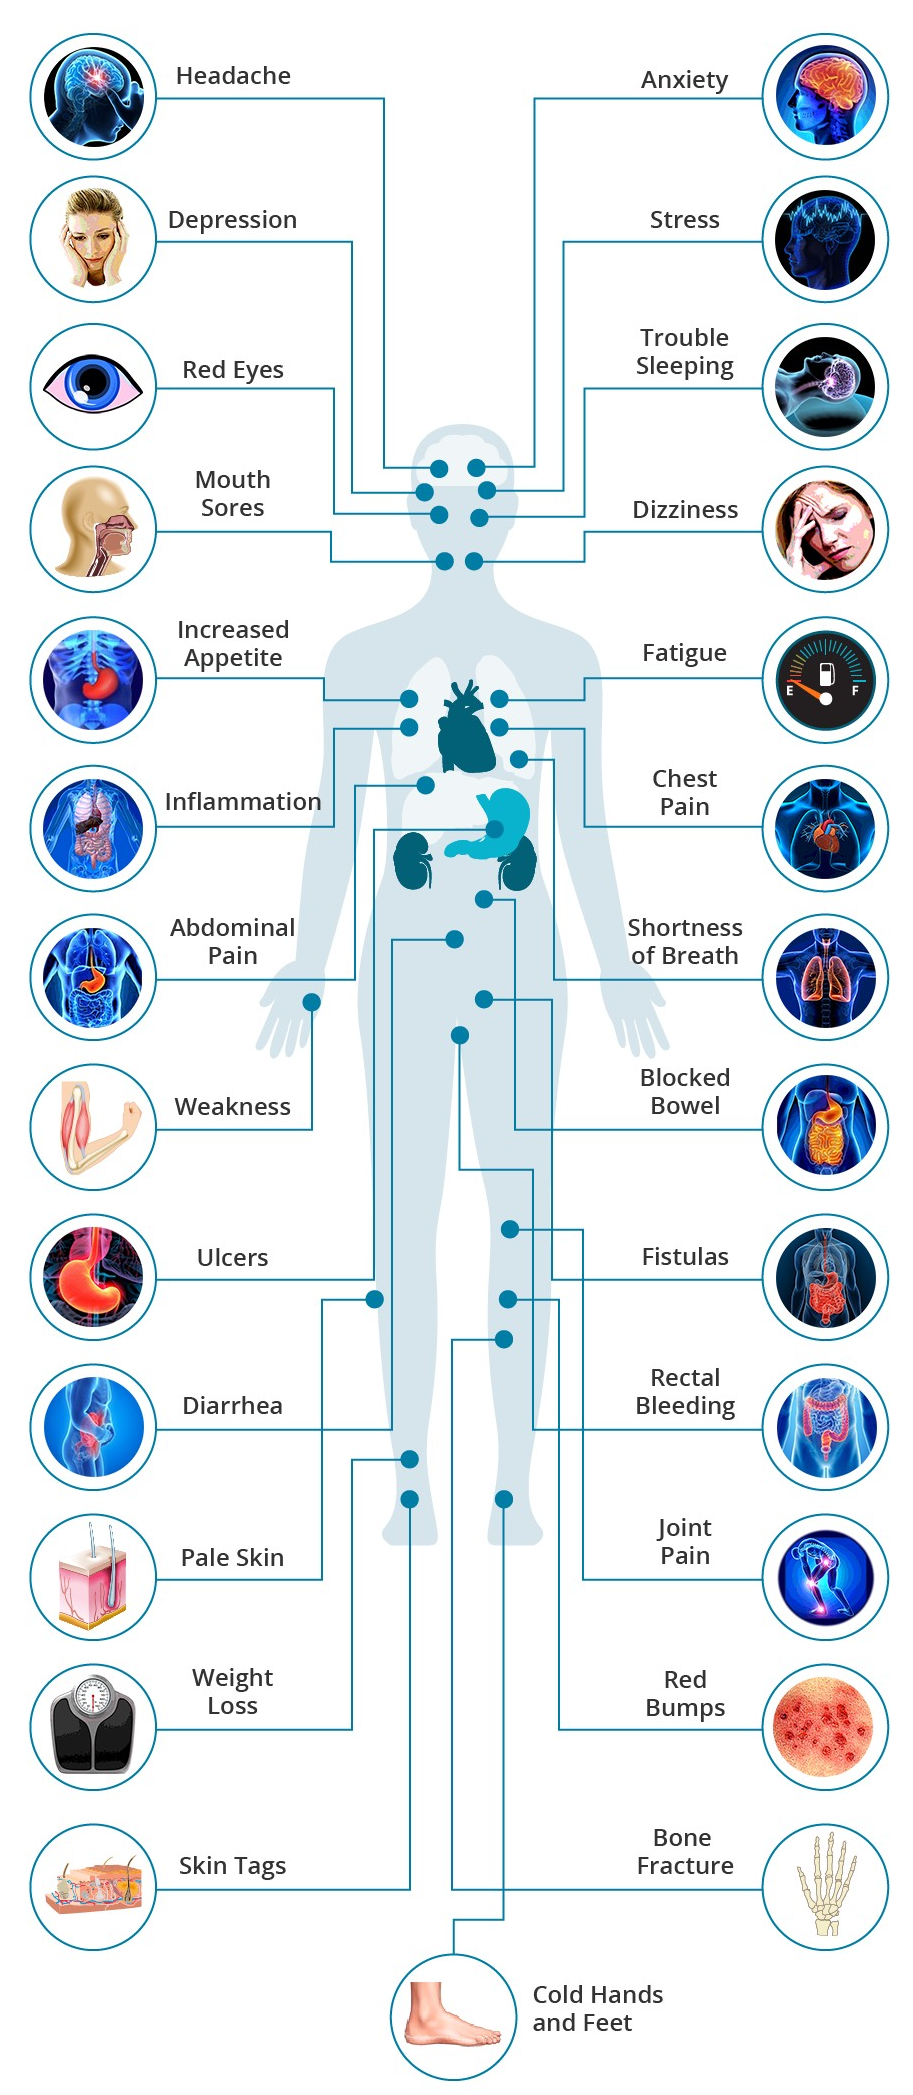 Crohn's Disease: Why Do I Feel This Way? | Crohns, Crohns ...